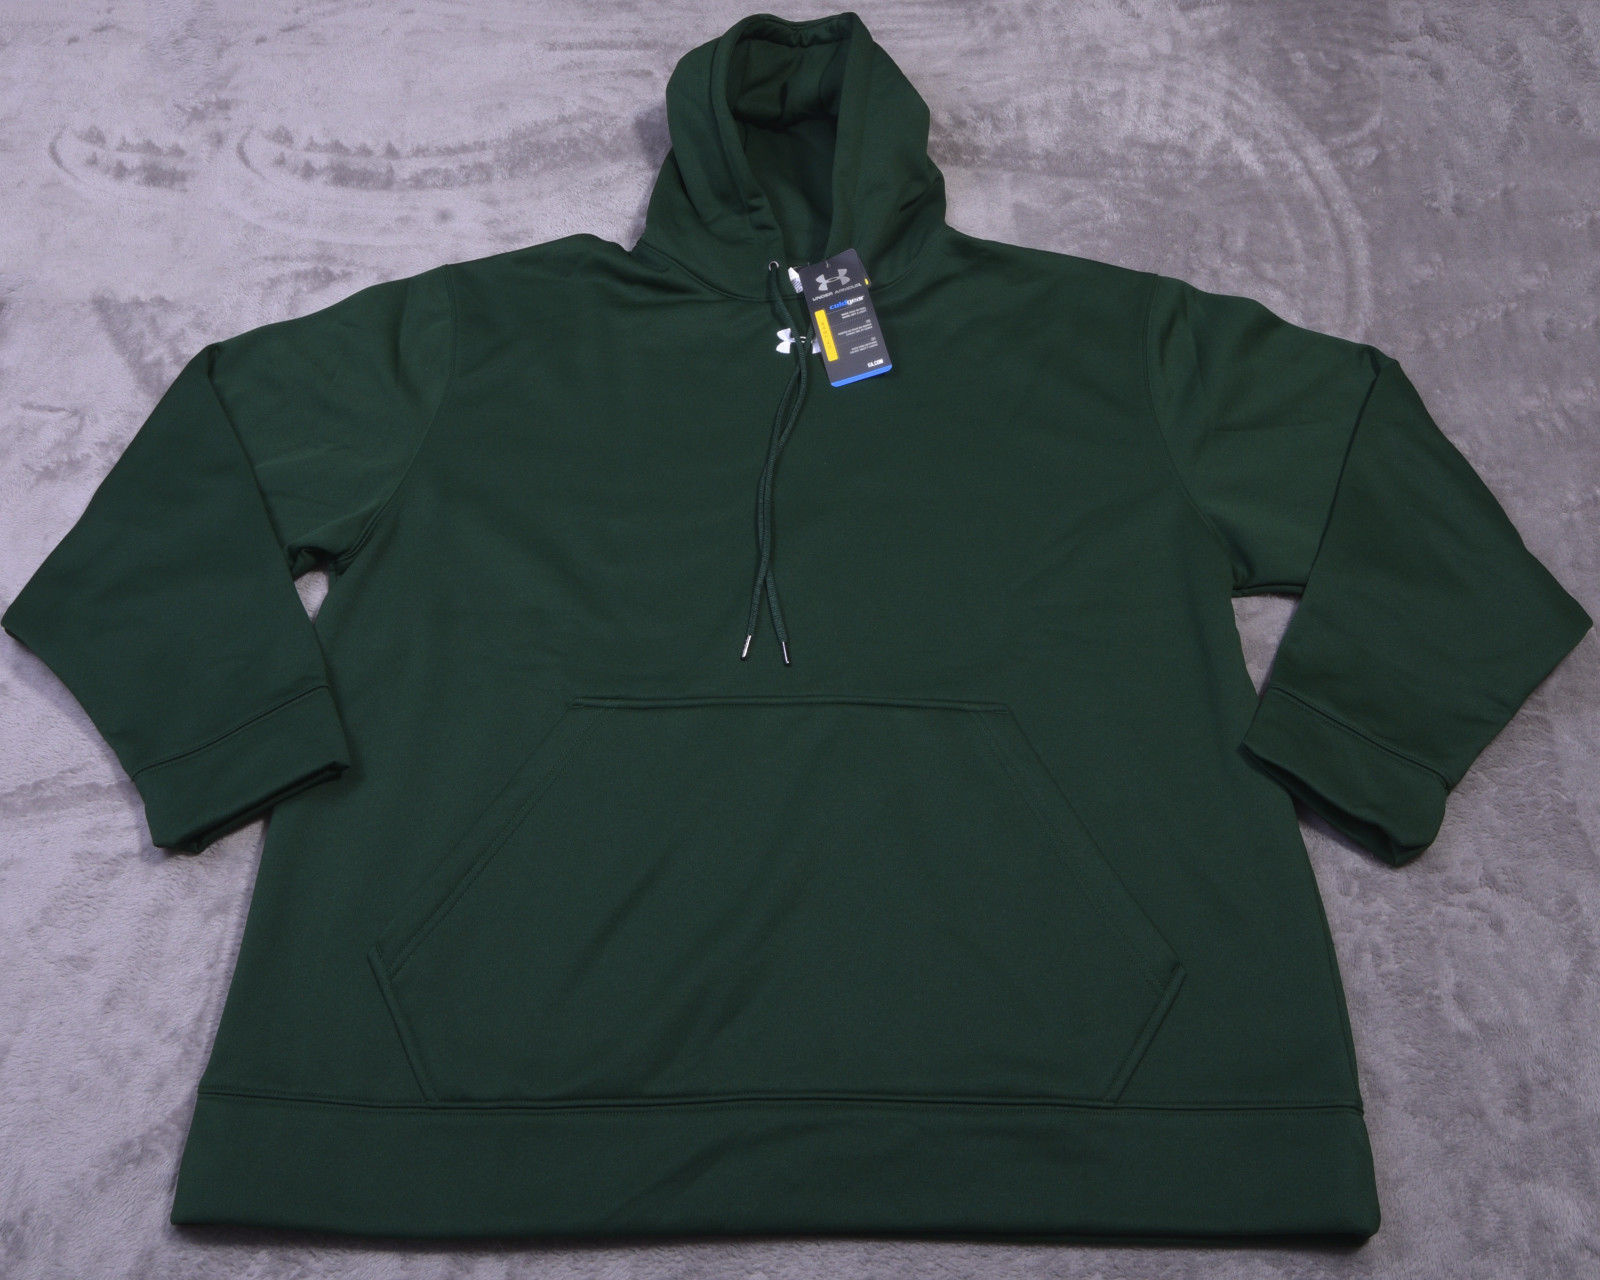 UNDER ARMOUR Hooded MENS SWEATSHIRT Long Sleeve Green XL Hoodie NWT NEW - $53.66